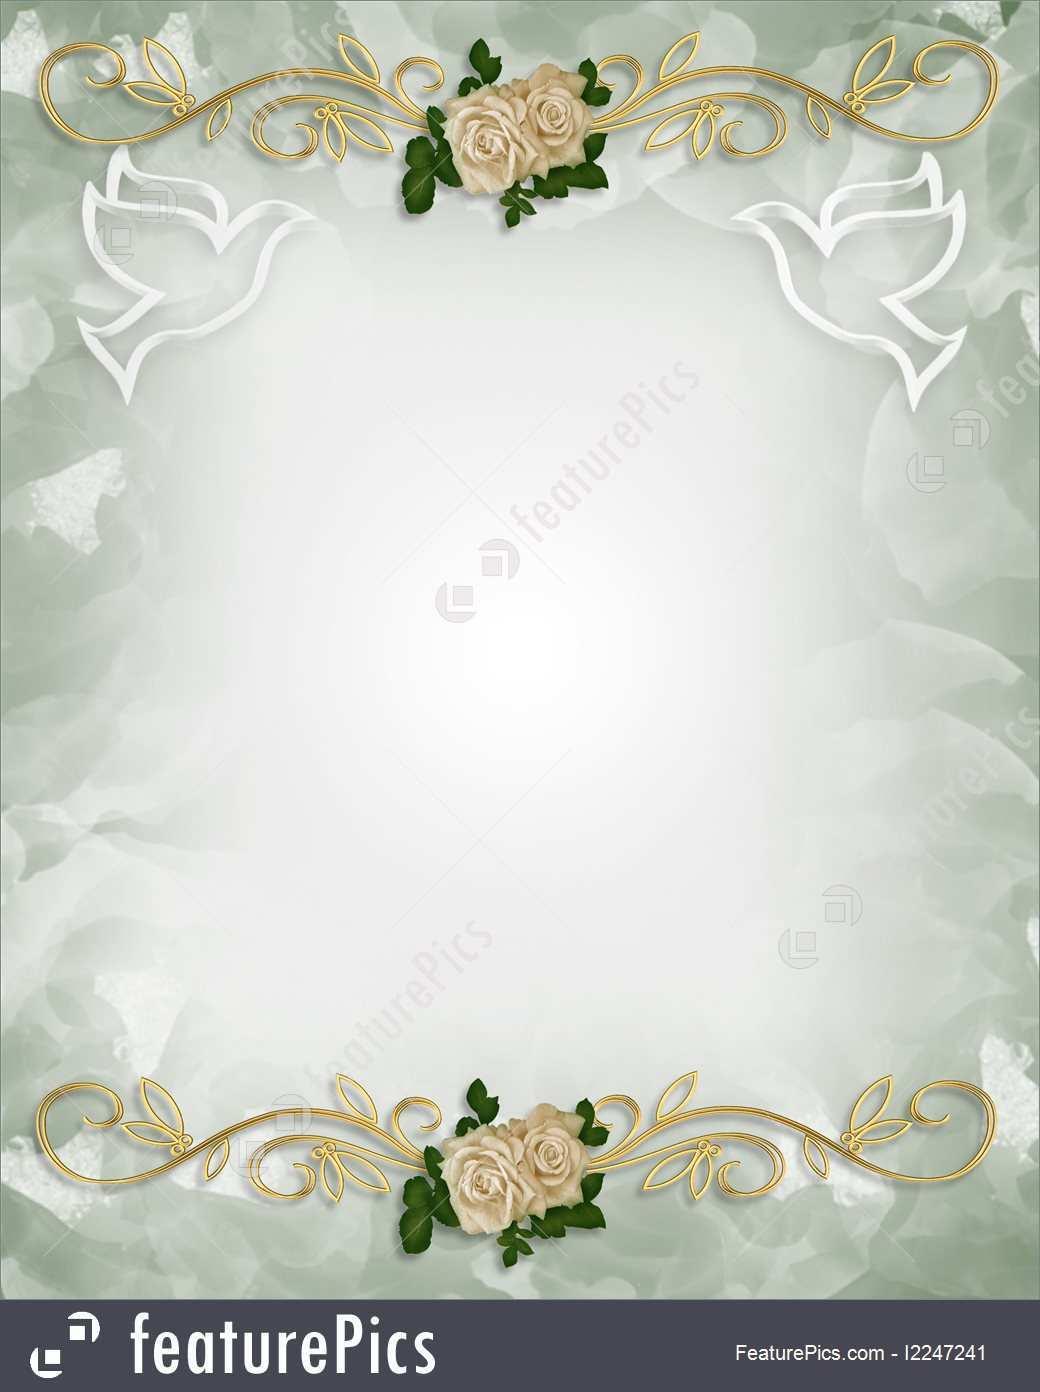 25 Free Printable Wedding Invitation Template Background Download for Wedding Invitation Template Background